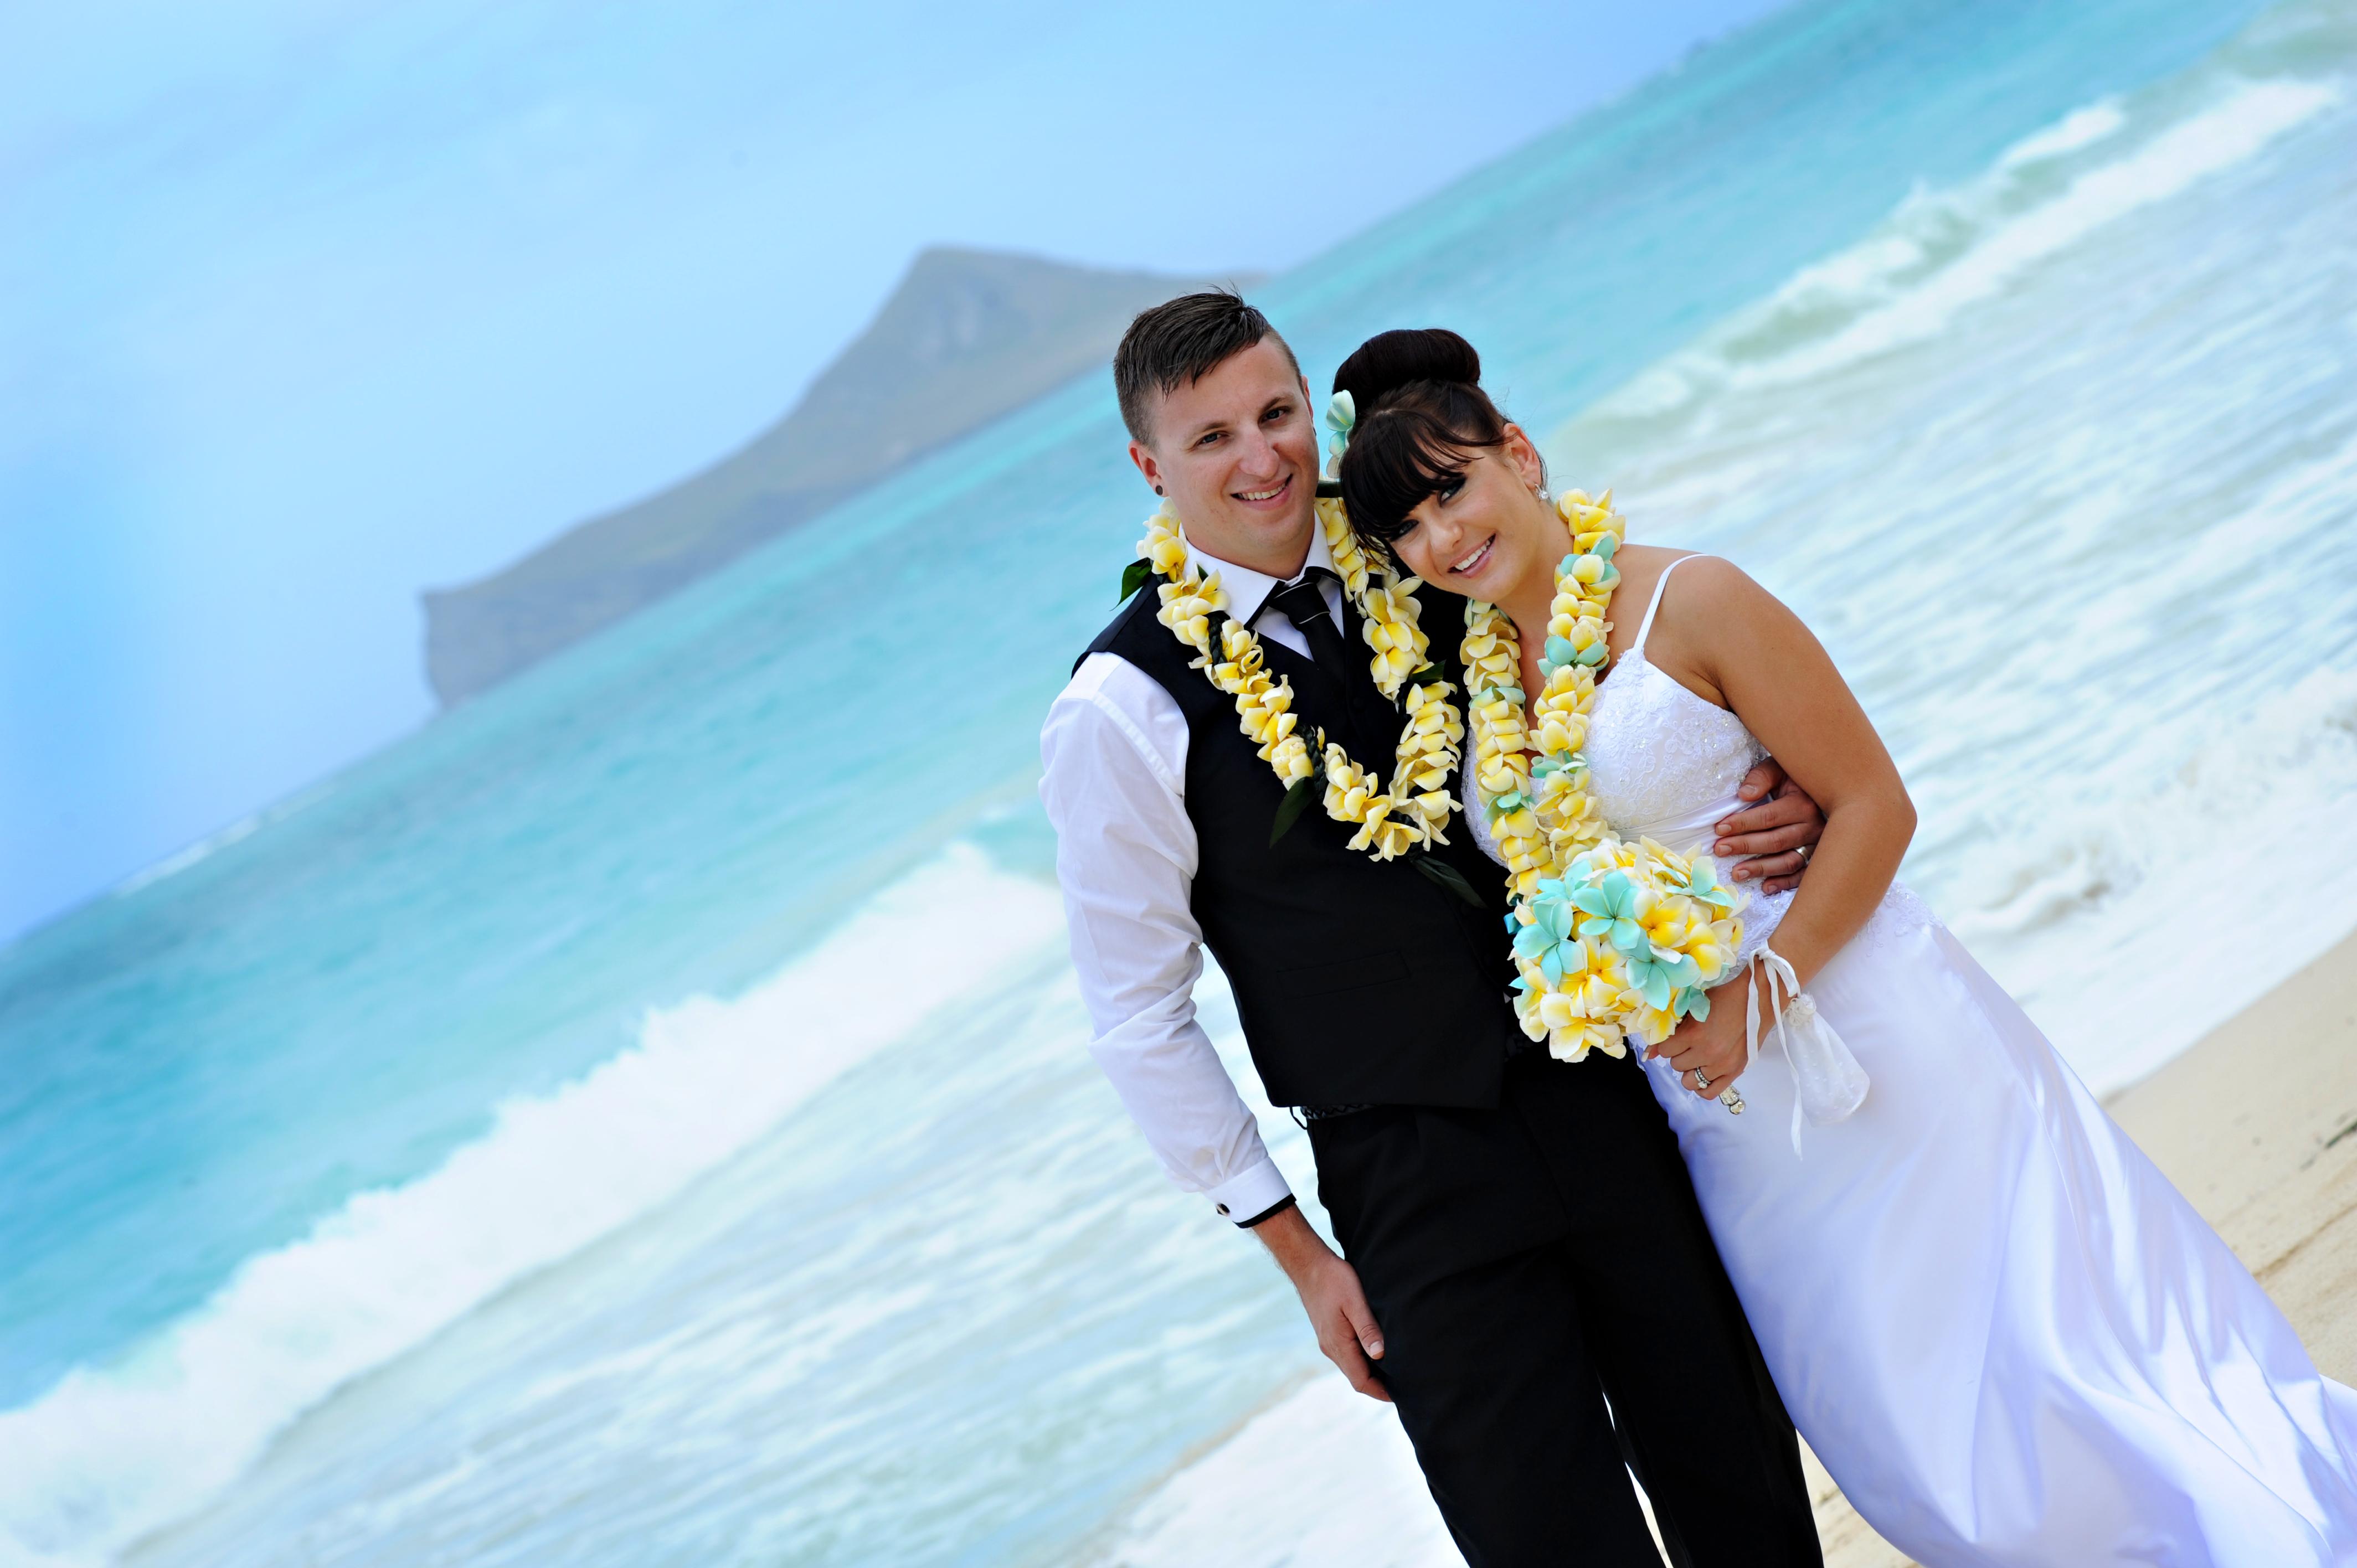 Alohaislandweddings.com- Wedding Picture in Hawaii-30